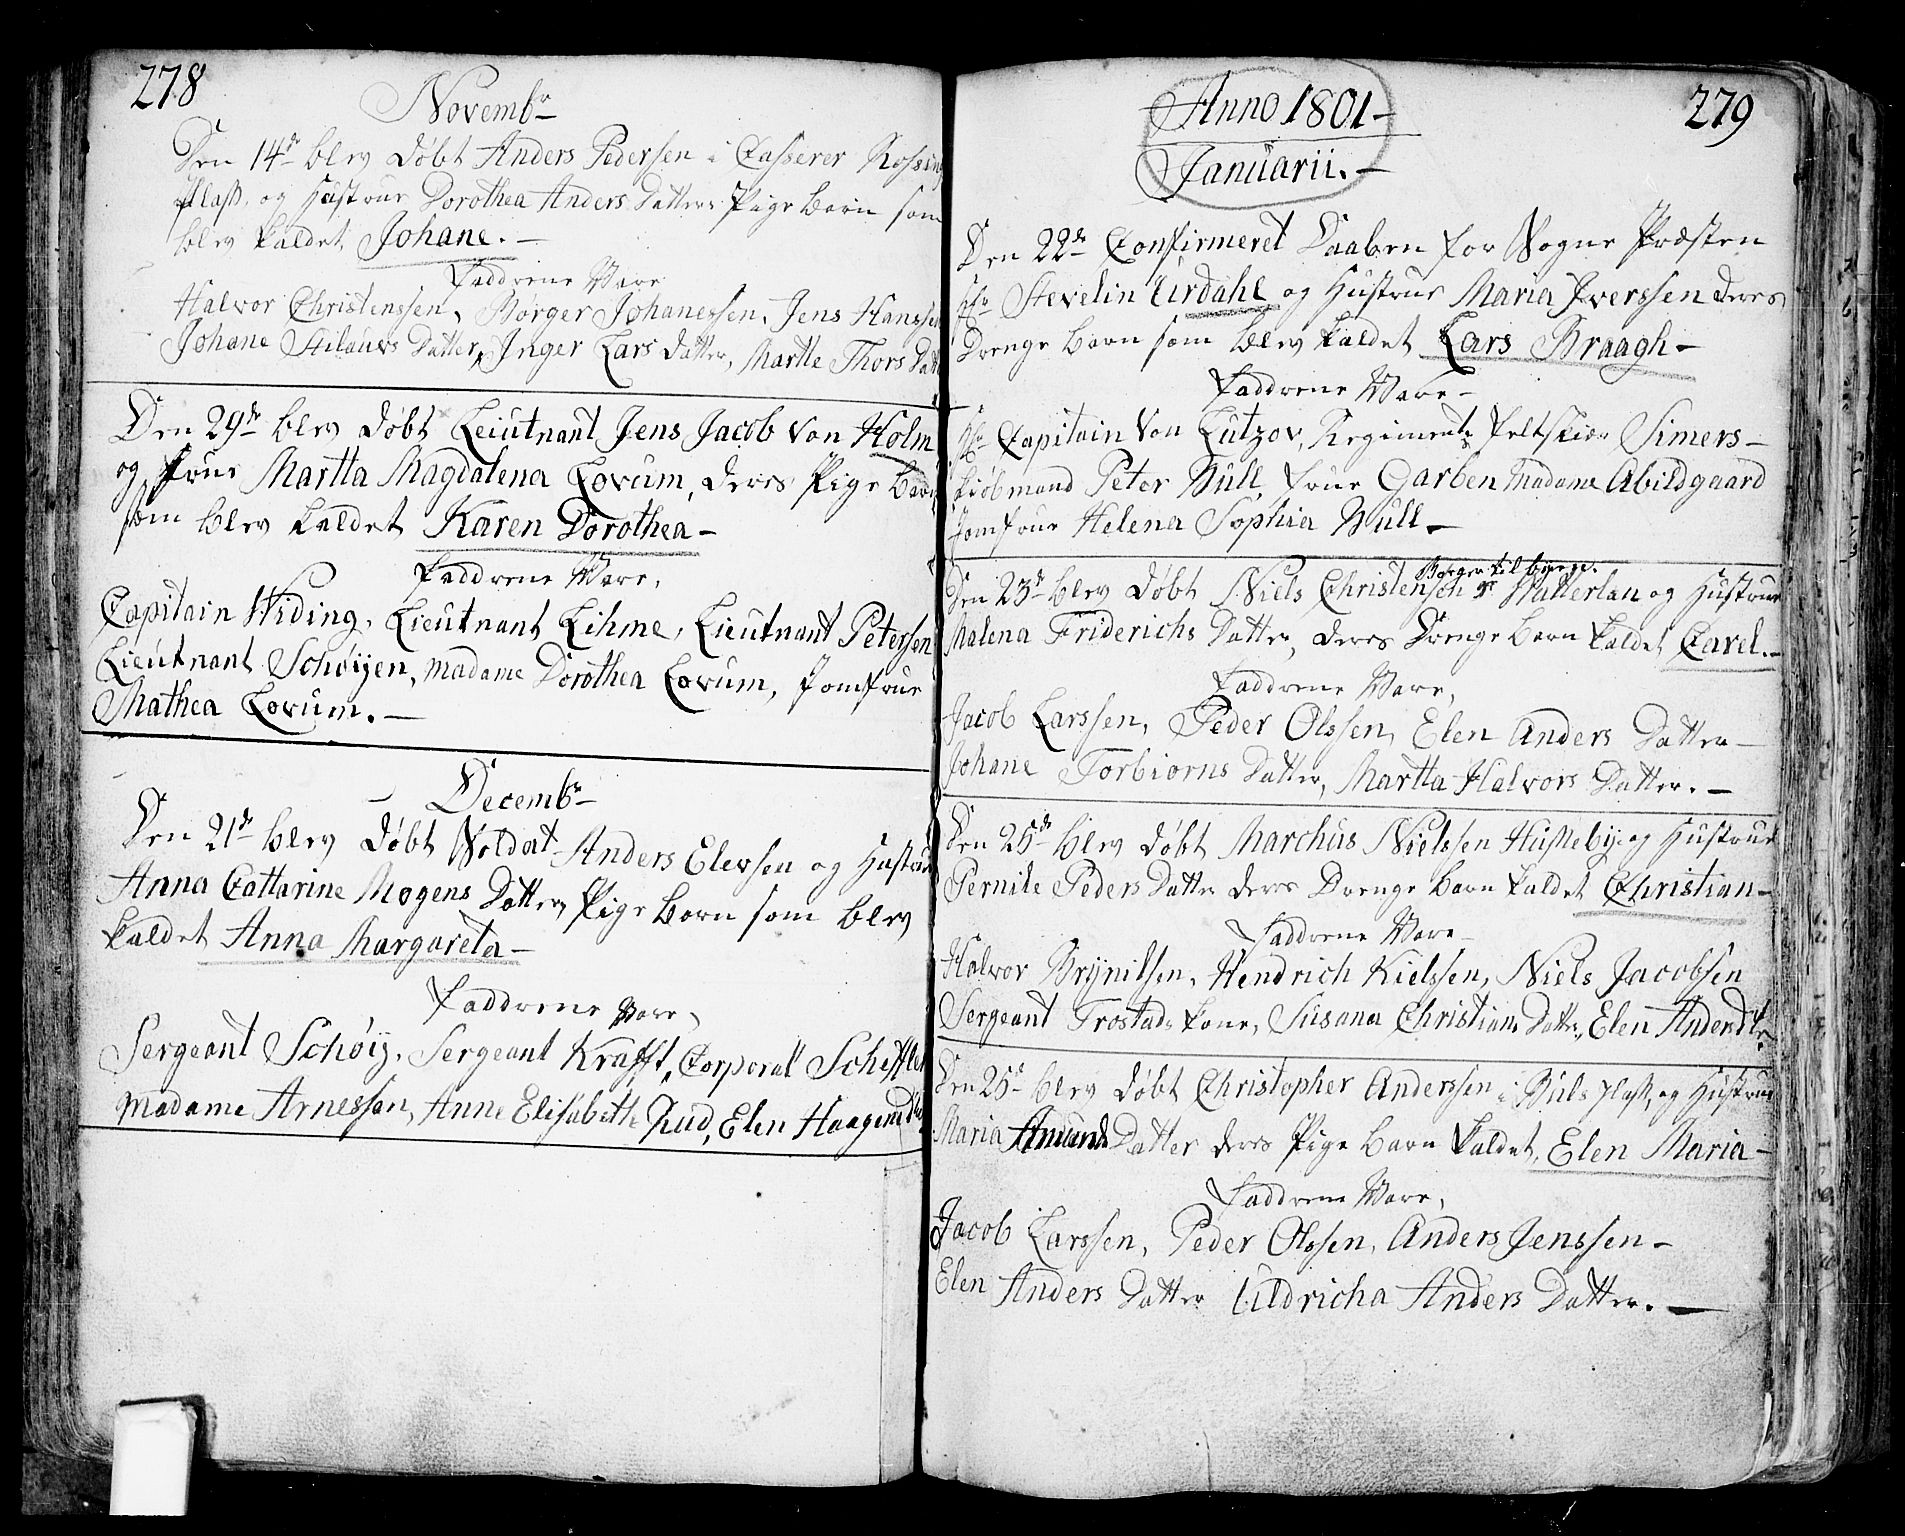 SAO, Fredrikstad prestekontor Kirkebøker, F/Fa/L0002: Ministerialbok nr. 2, 1750-1804, s. 278-279